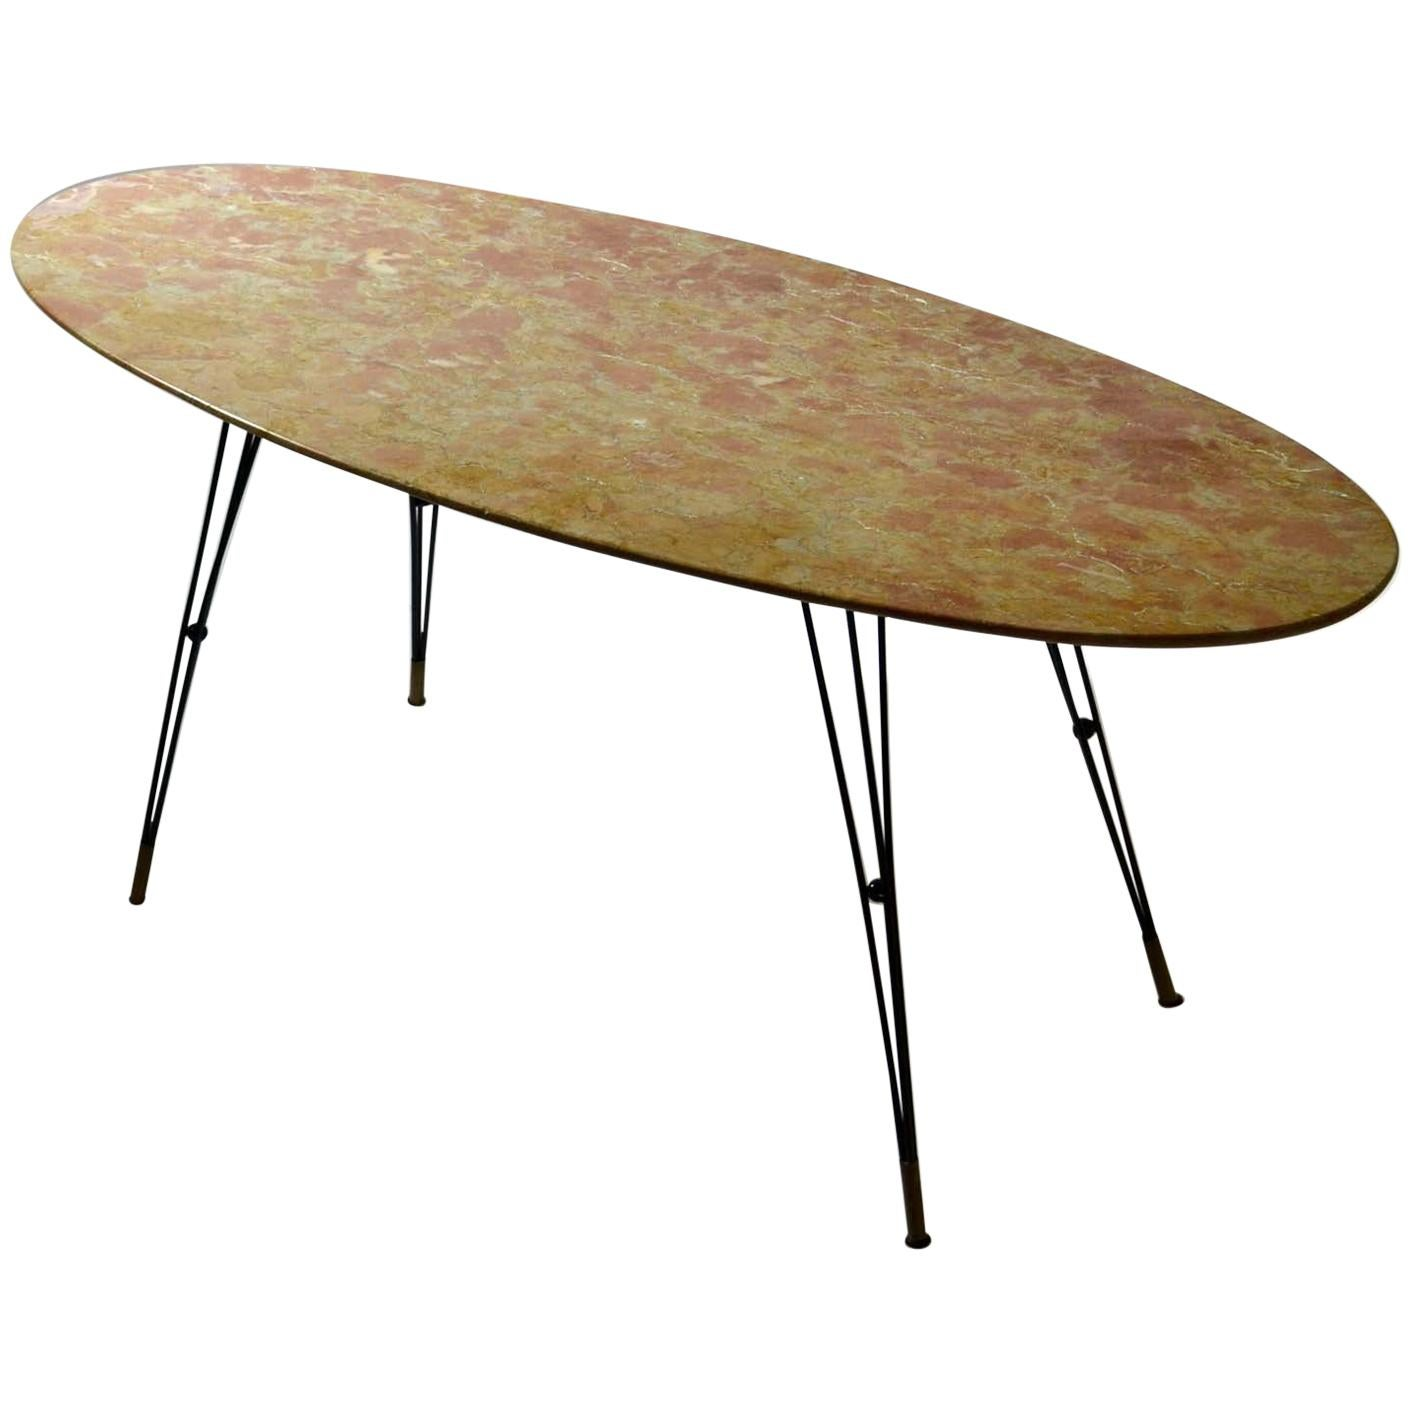 Oval Marble Cocktail Table on Black Spider Legs 1950s Italian